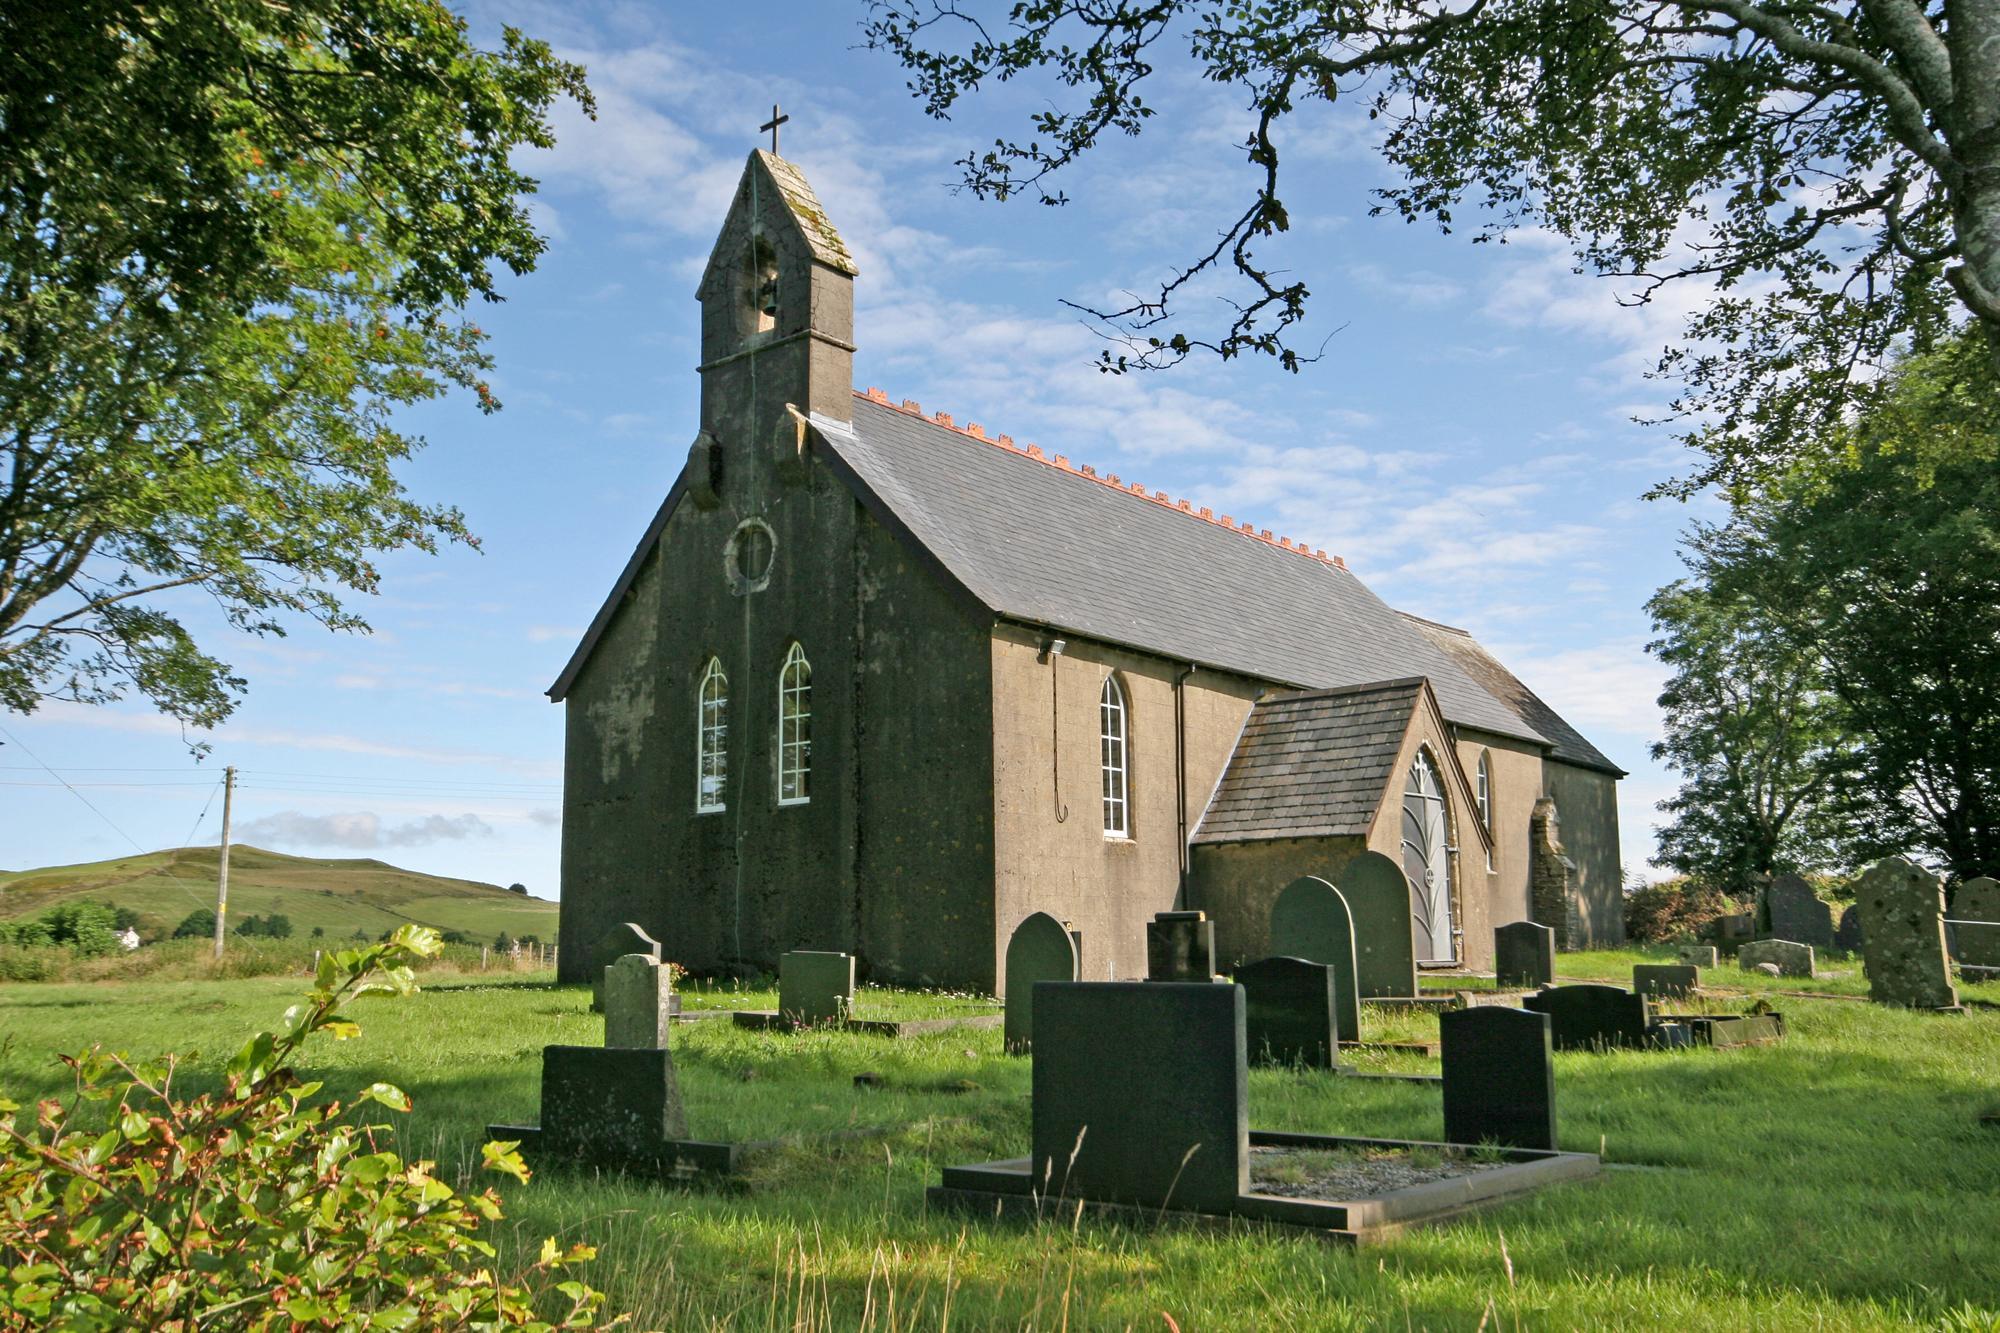 The Church of Three Saints, Llantrisant